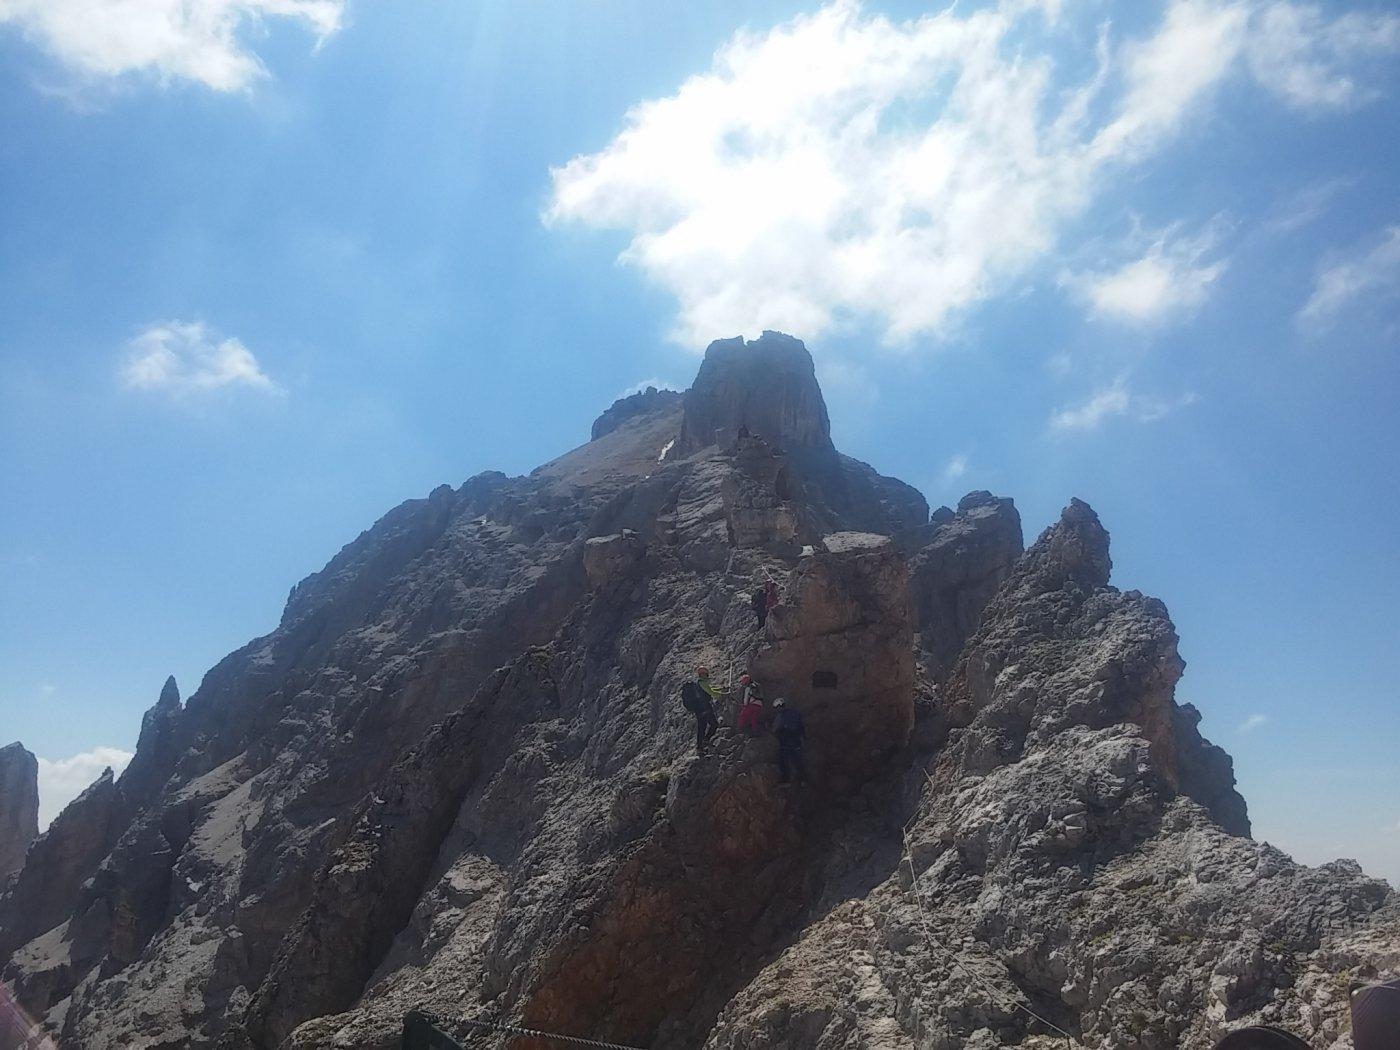 La cima vista dal rifugio Lorenzi